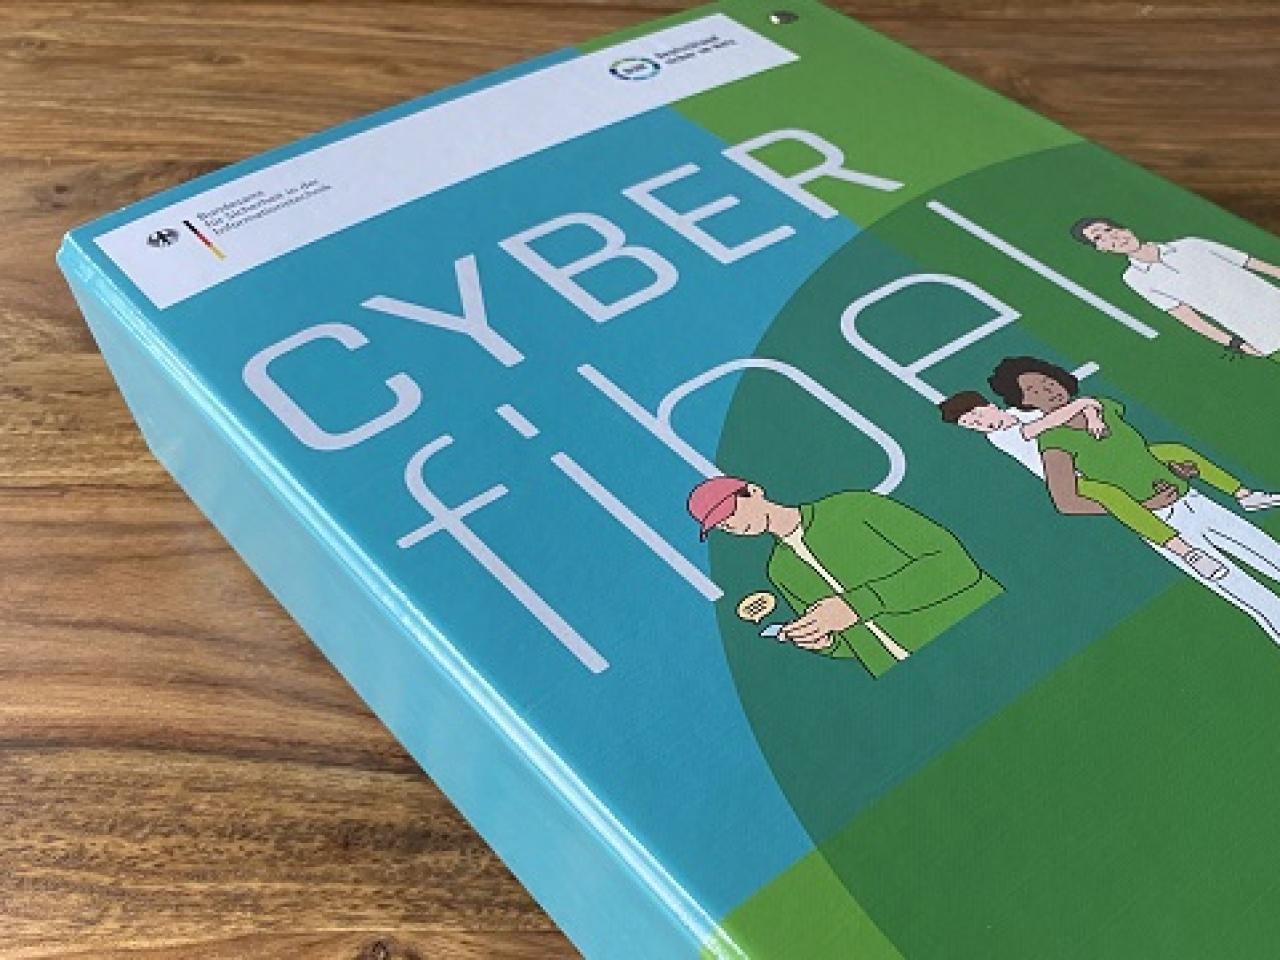 Gedrucktes Exemplar der Cyberfibel